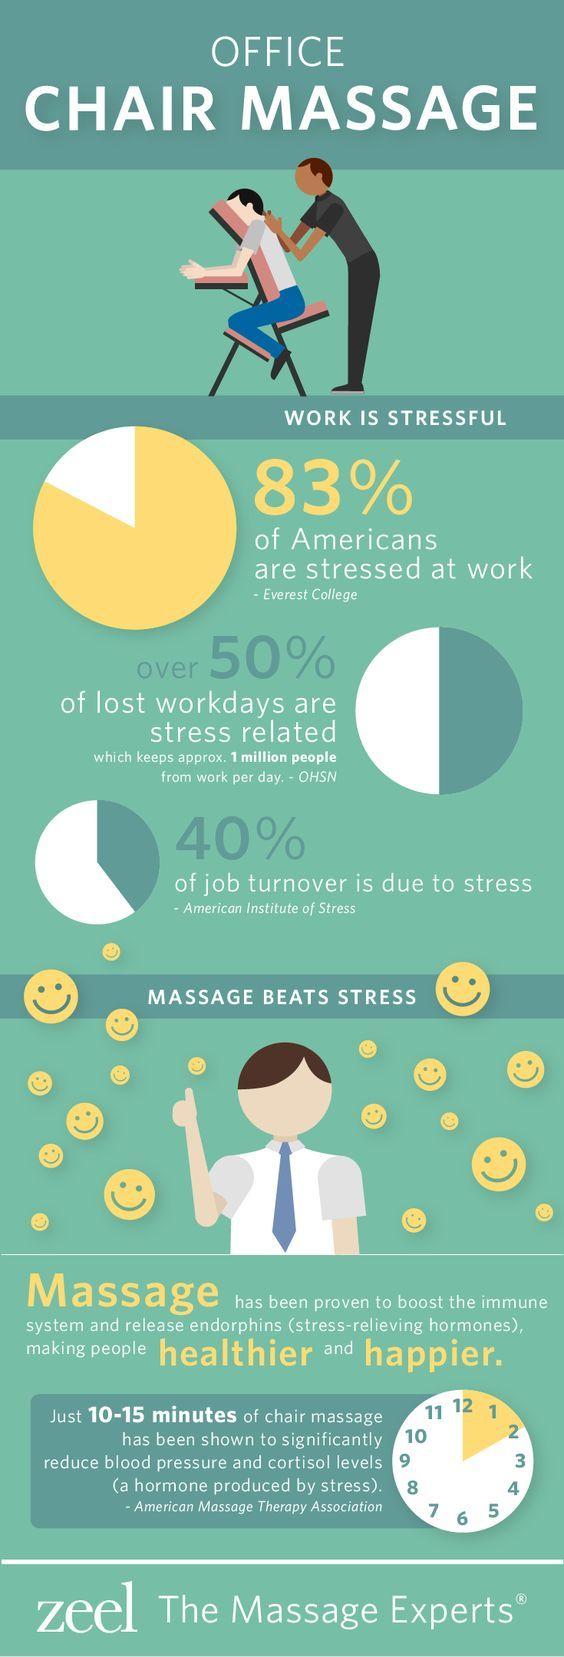 Chair massage benefits - Chair Massage Hadley Ma Chair Massage In Hadley Ma 01035 The Massage Therapy Pinterest